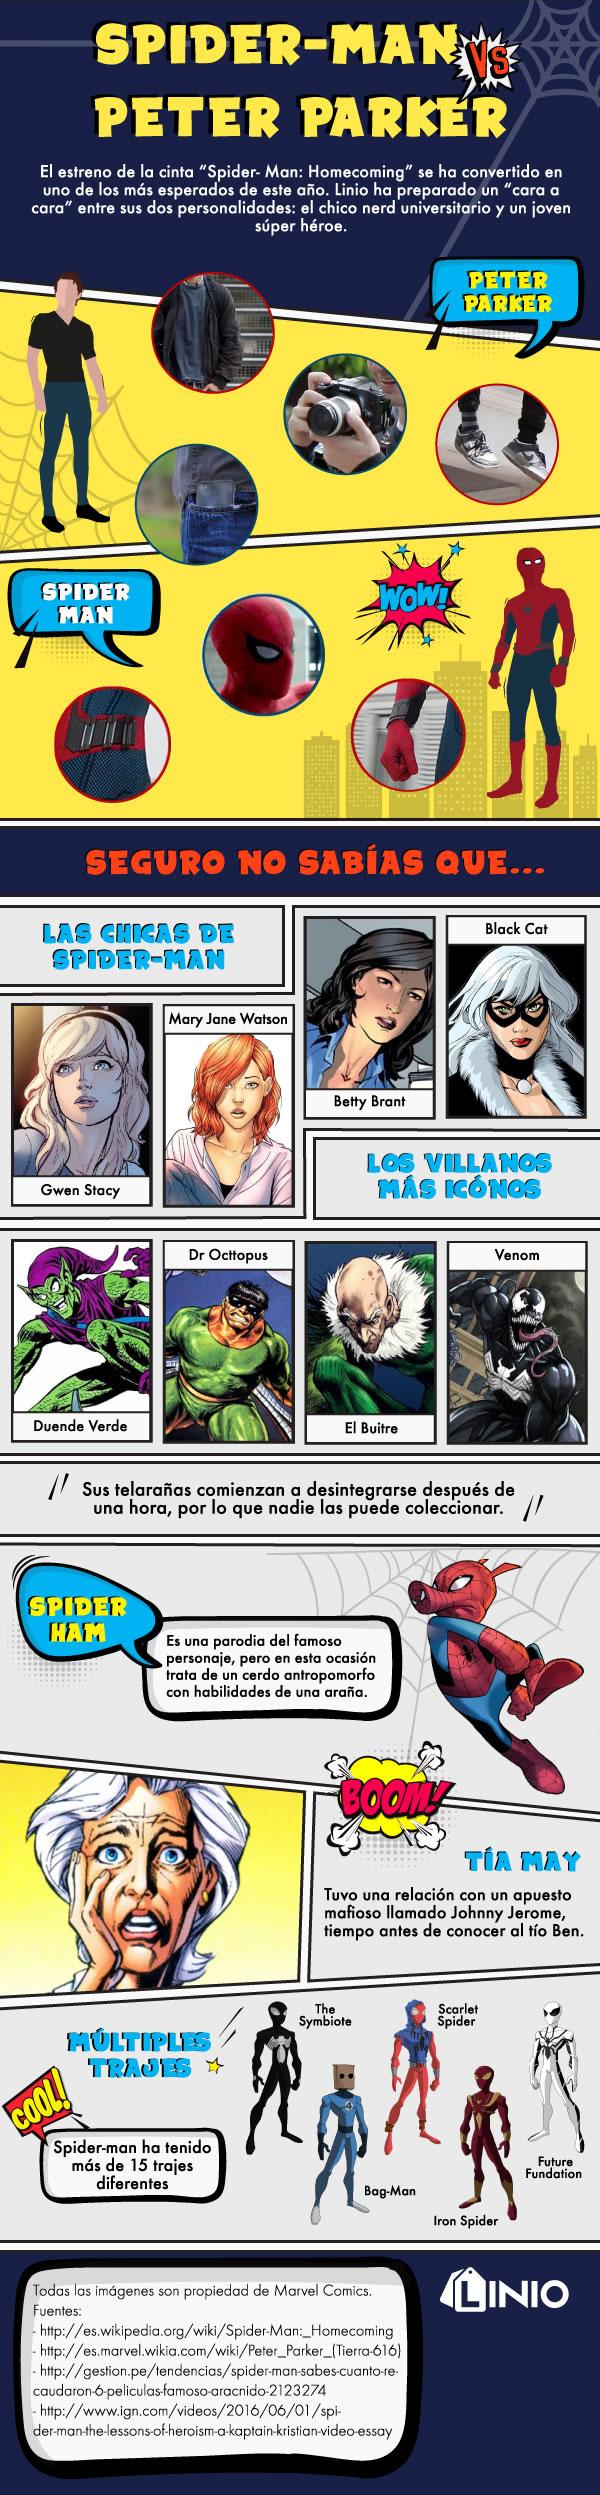 Cara a cara: Peter Parker vs Spider-Man - spiderman-2017-infografia